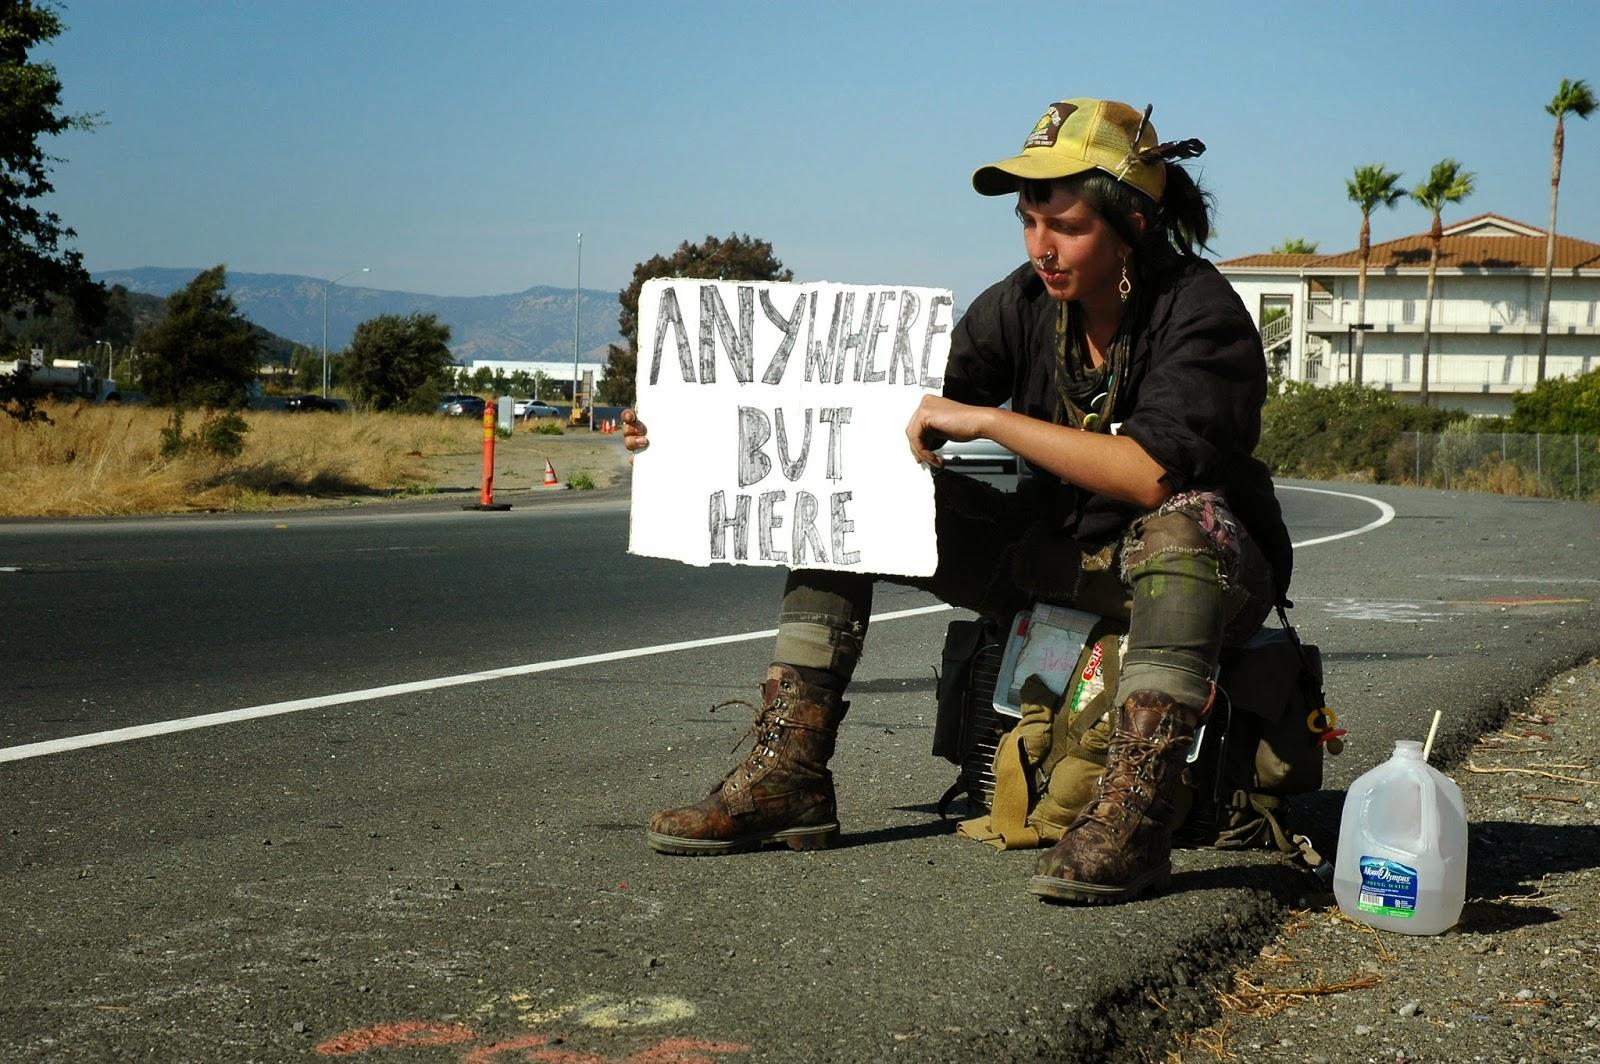 Yorkshire Pudding: Hitchhiking